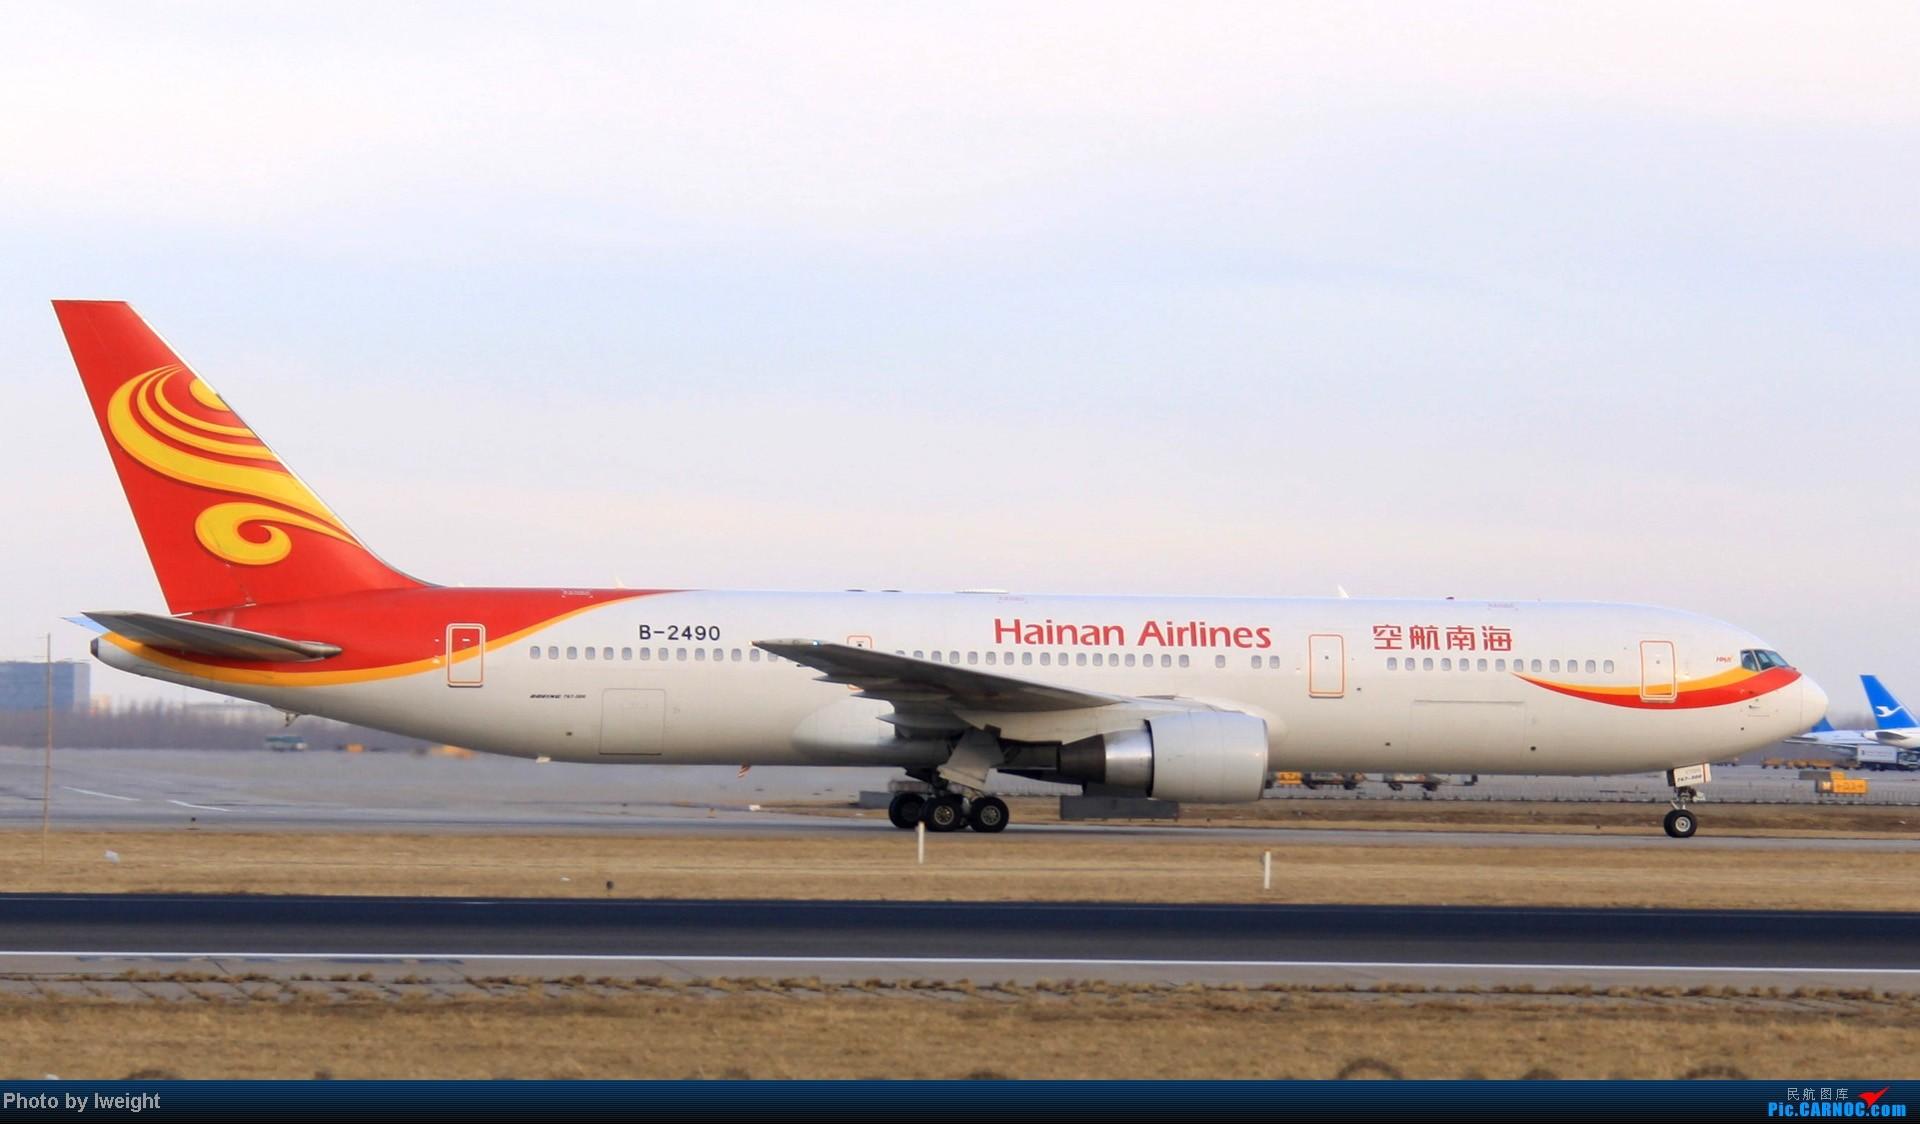 Re:[原创]今天下午瞎拍两个小时的杂图 BOEING 767-300 B-2490 中国北京首都机场